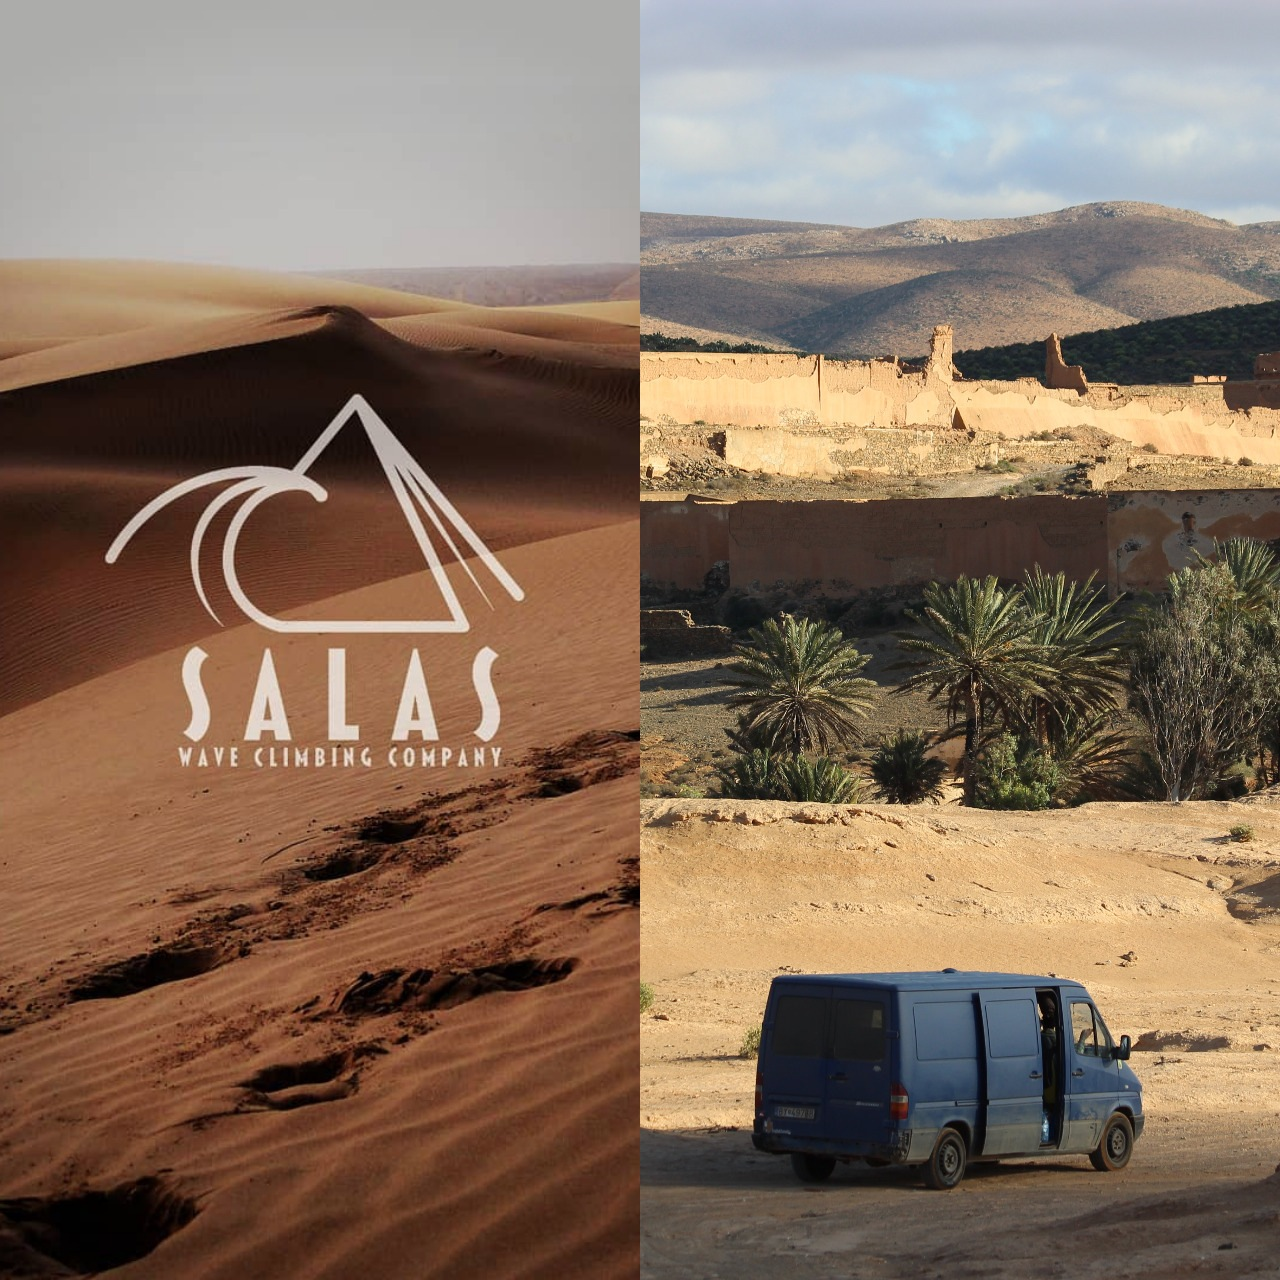 Salas waveclimbing company Maroko karavan